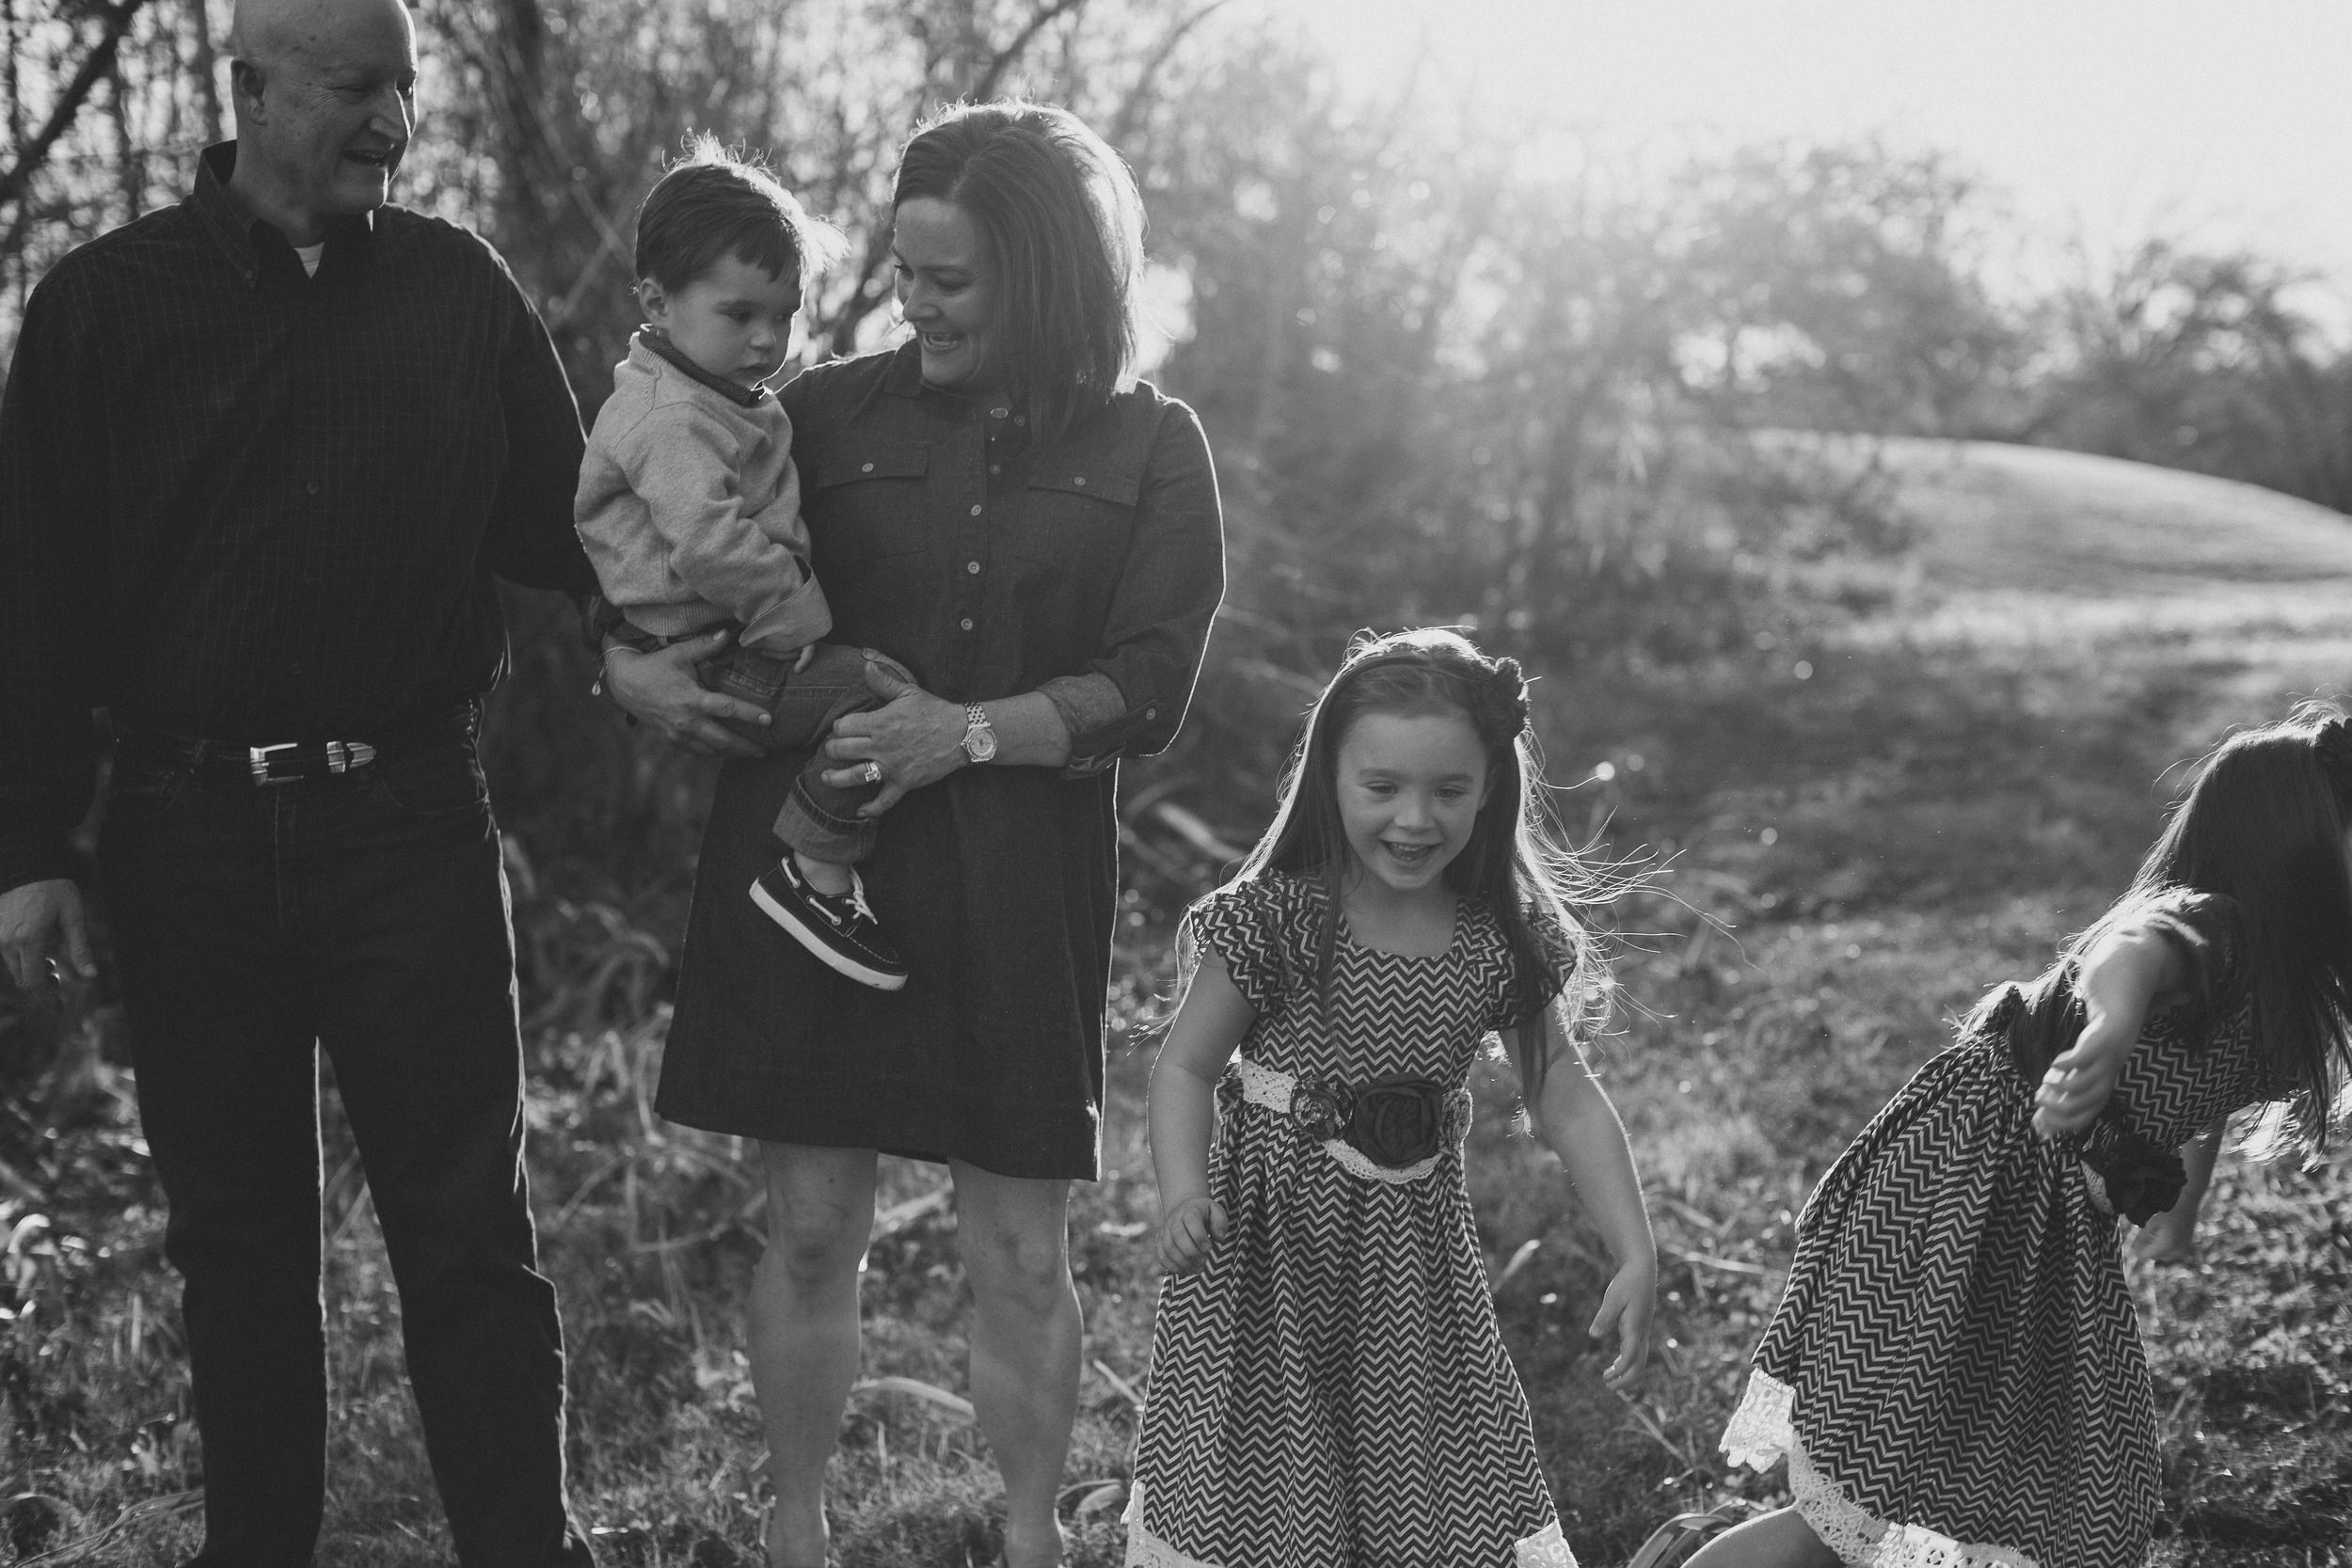 houstonfamilyphotographer_h2015_brimberry_bw-14.jpg